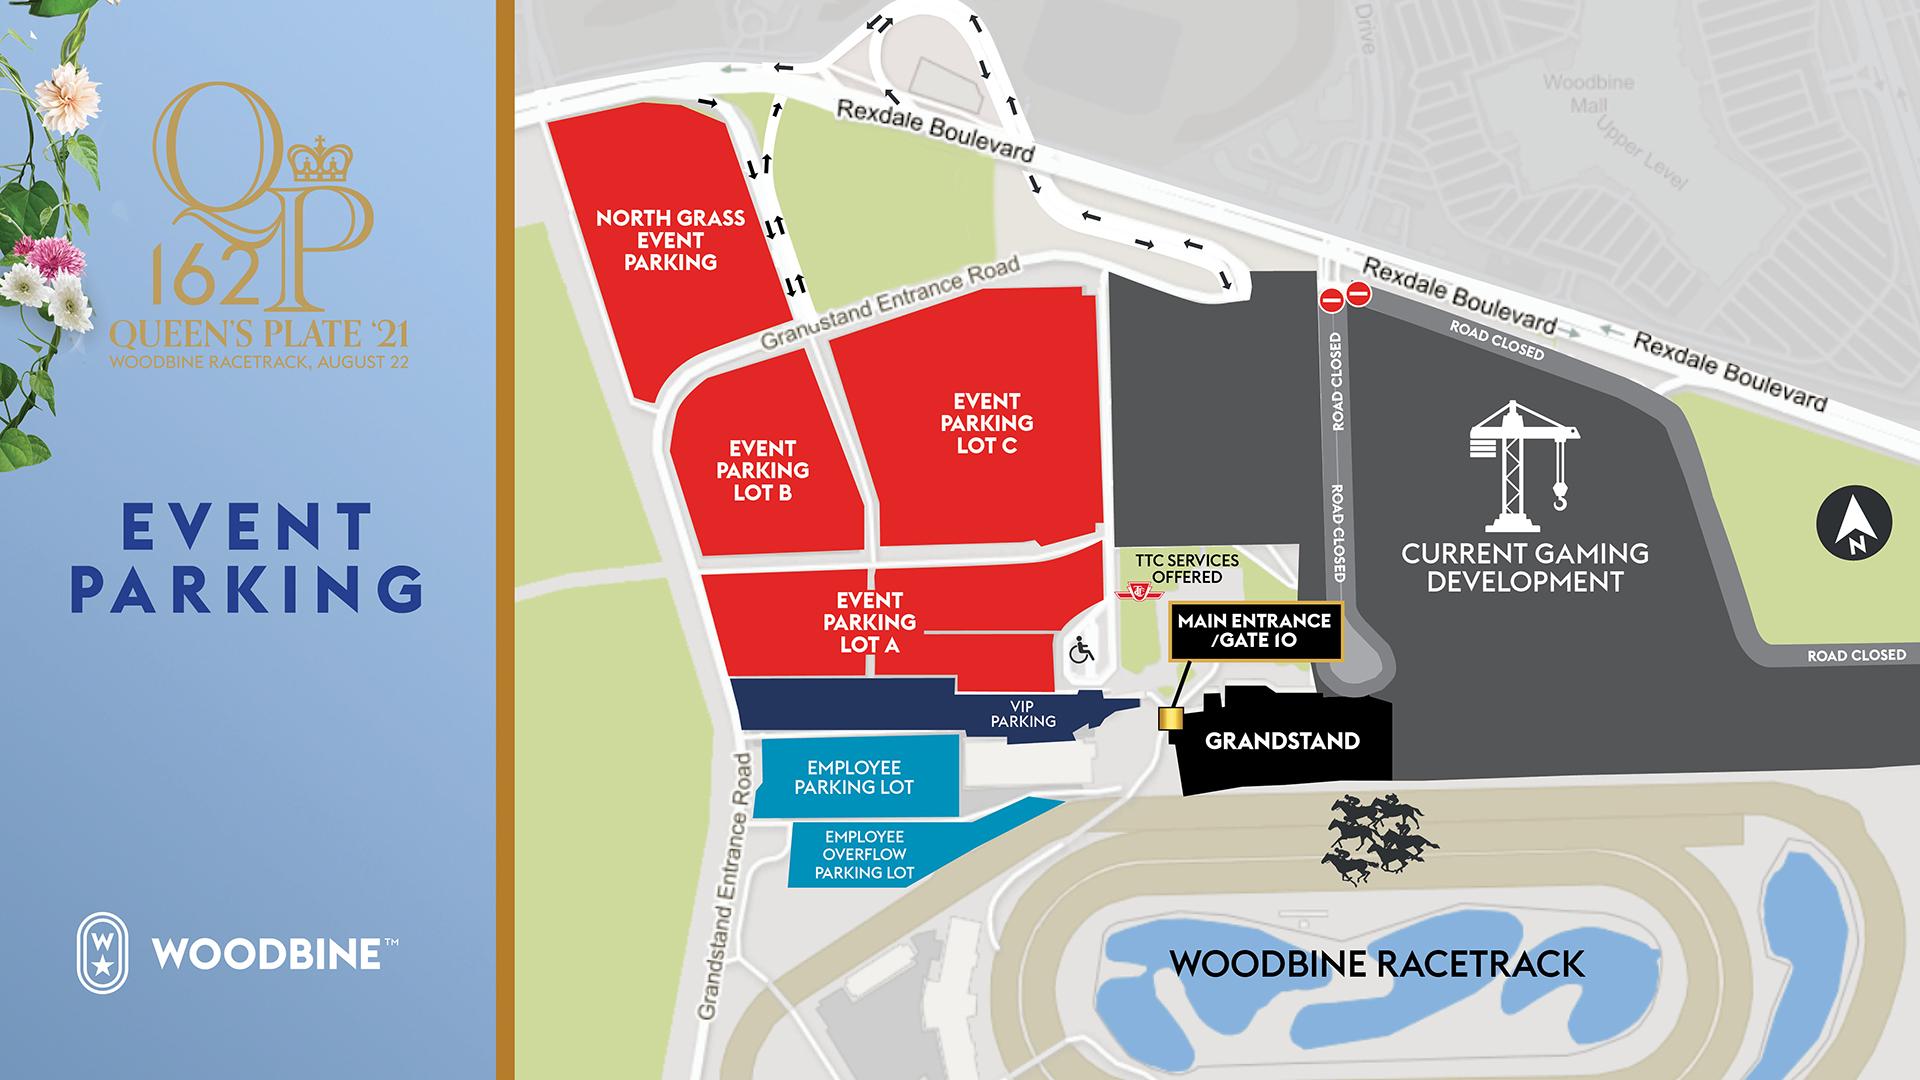 2021 Queen's Plate Parking map